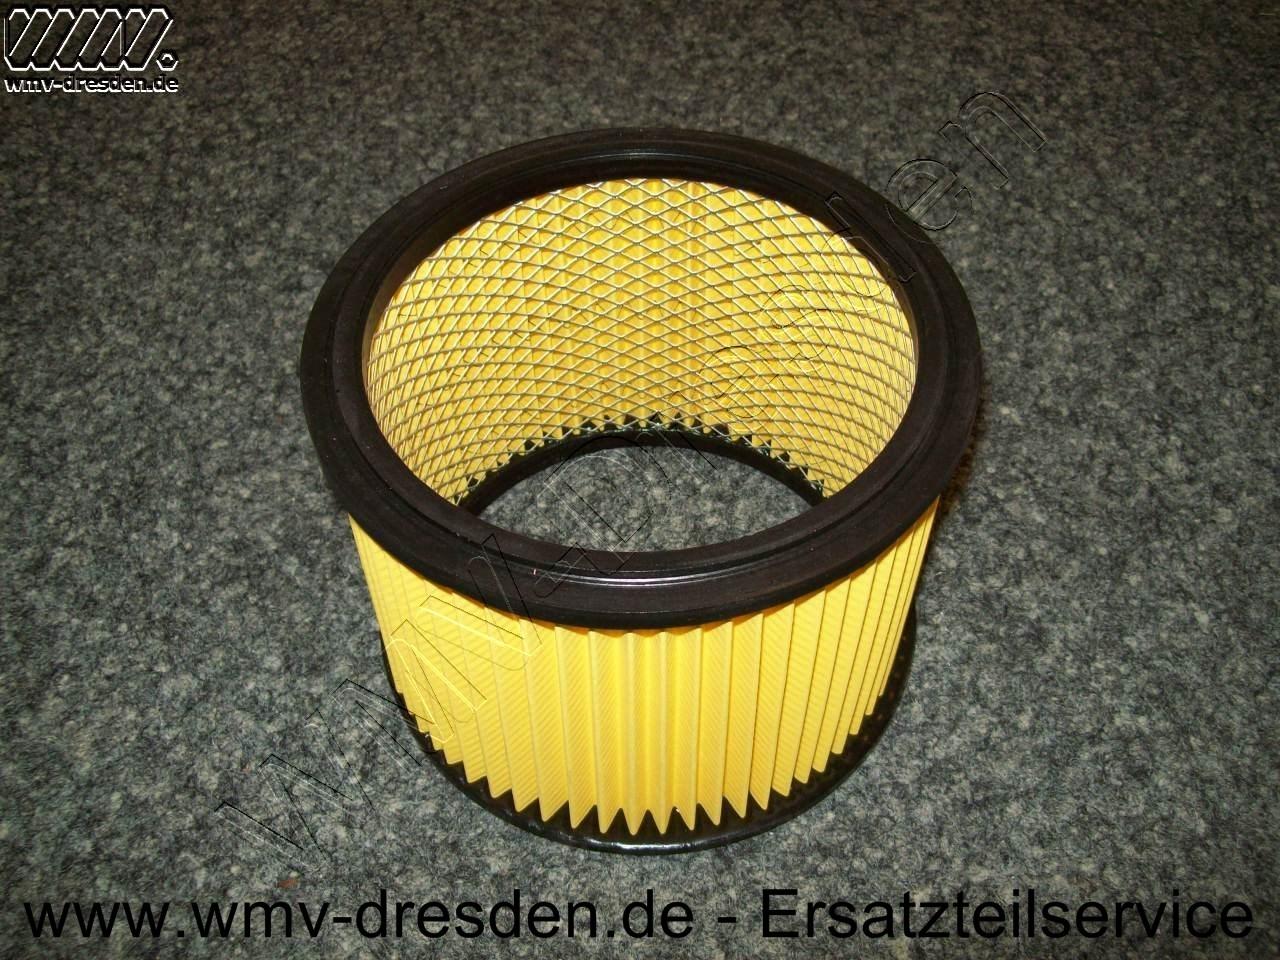 Trockenfilter / Faltenfilter NTS, Höhe 140 mm, Außen 185 mm, Innen 150 mm